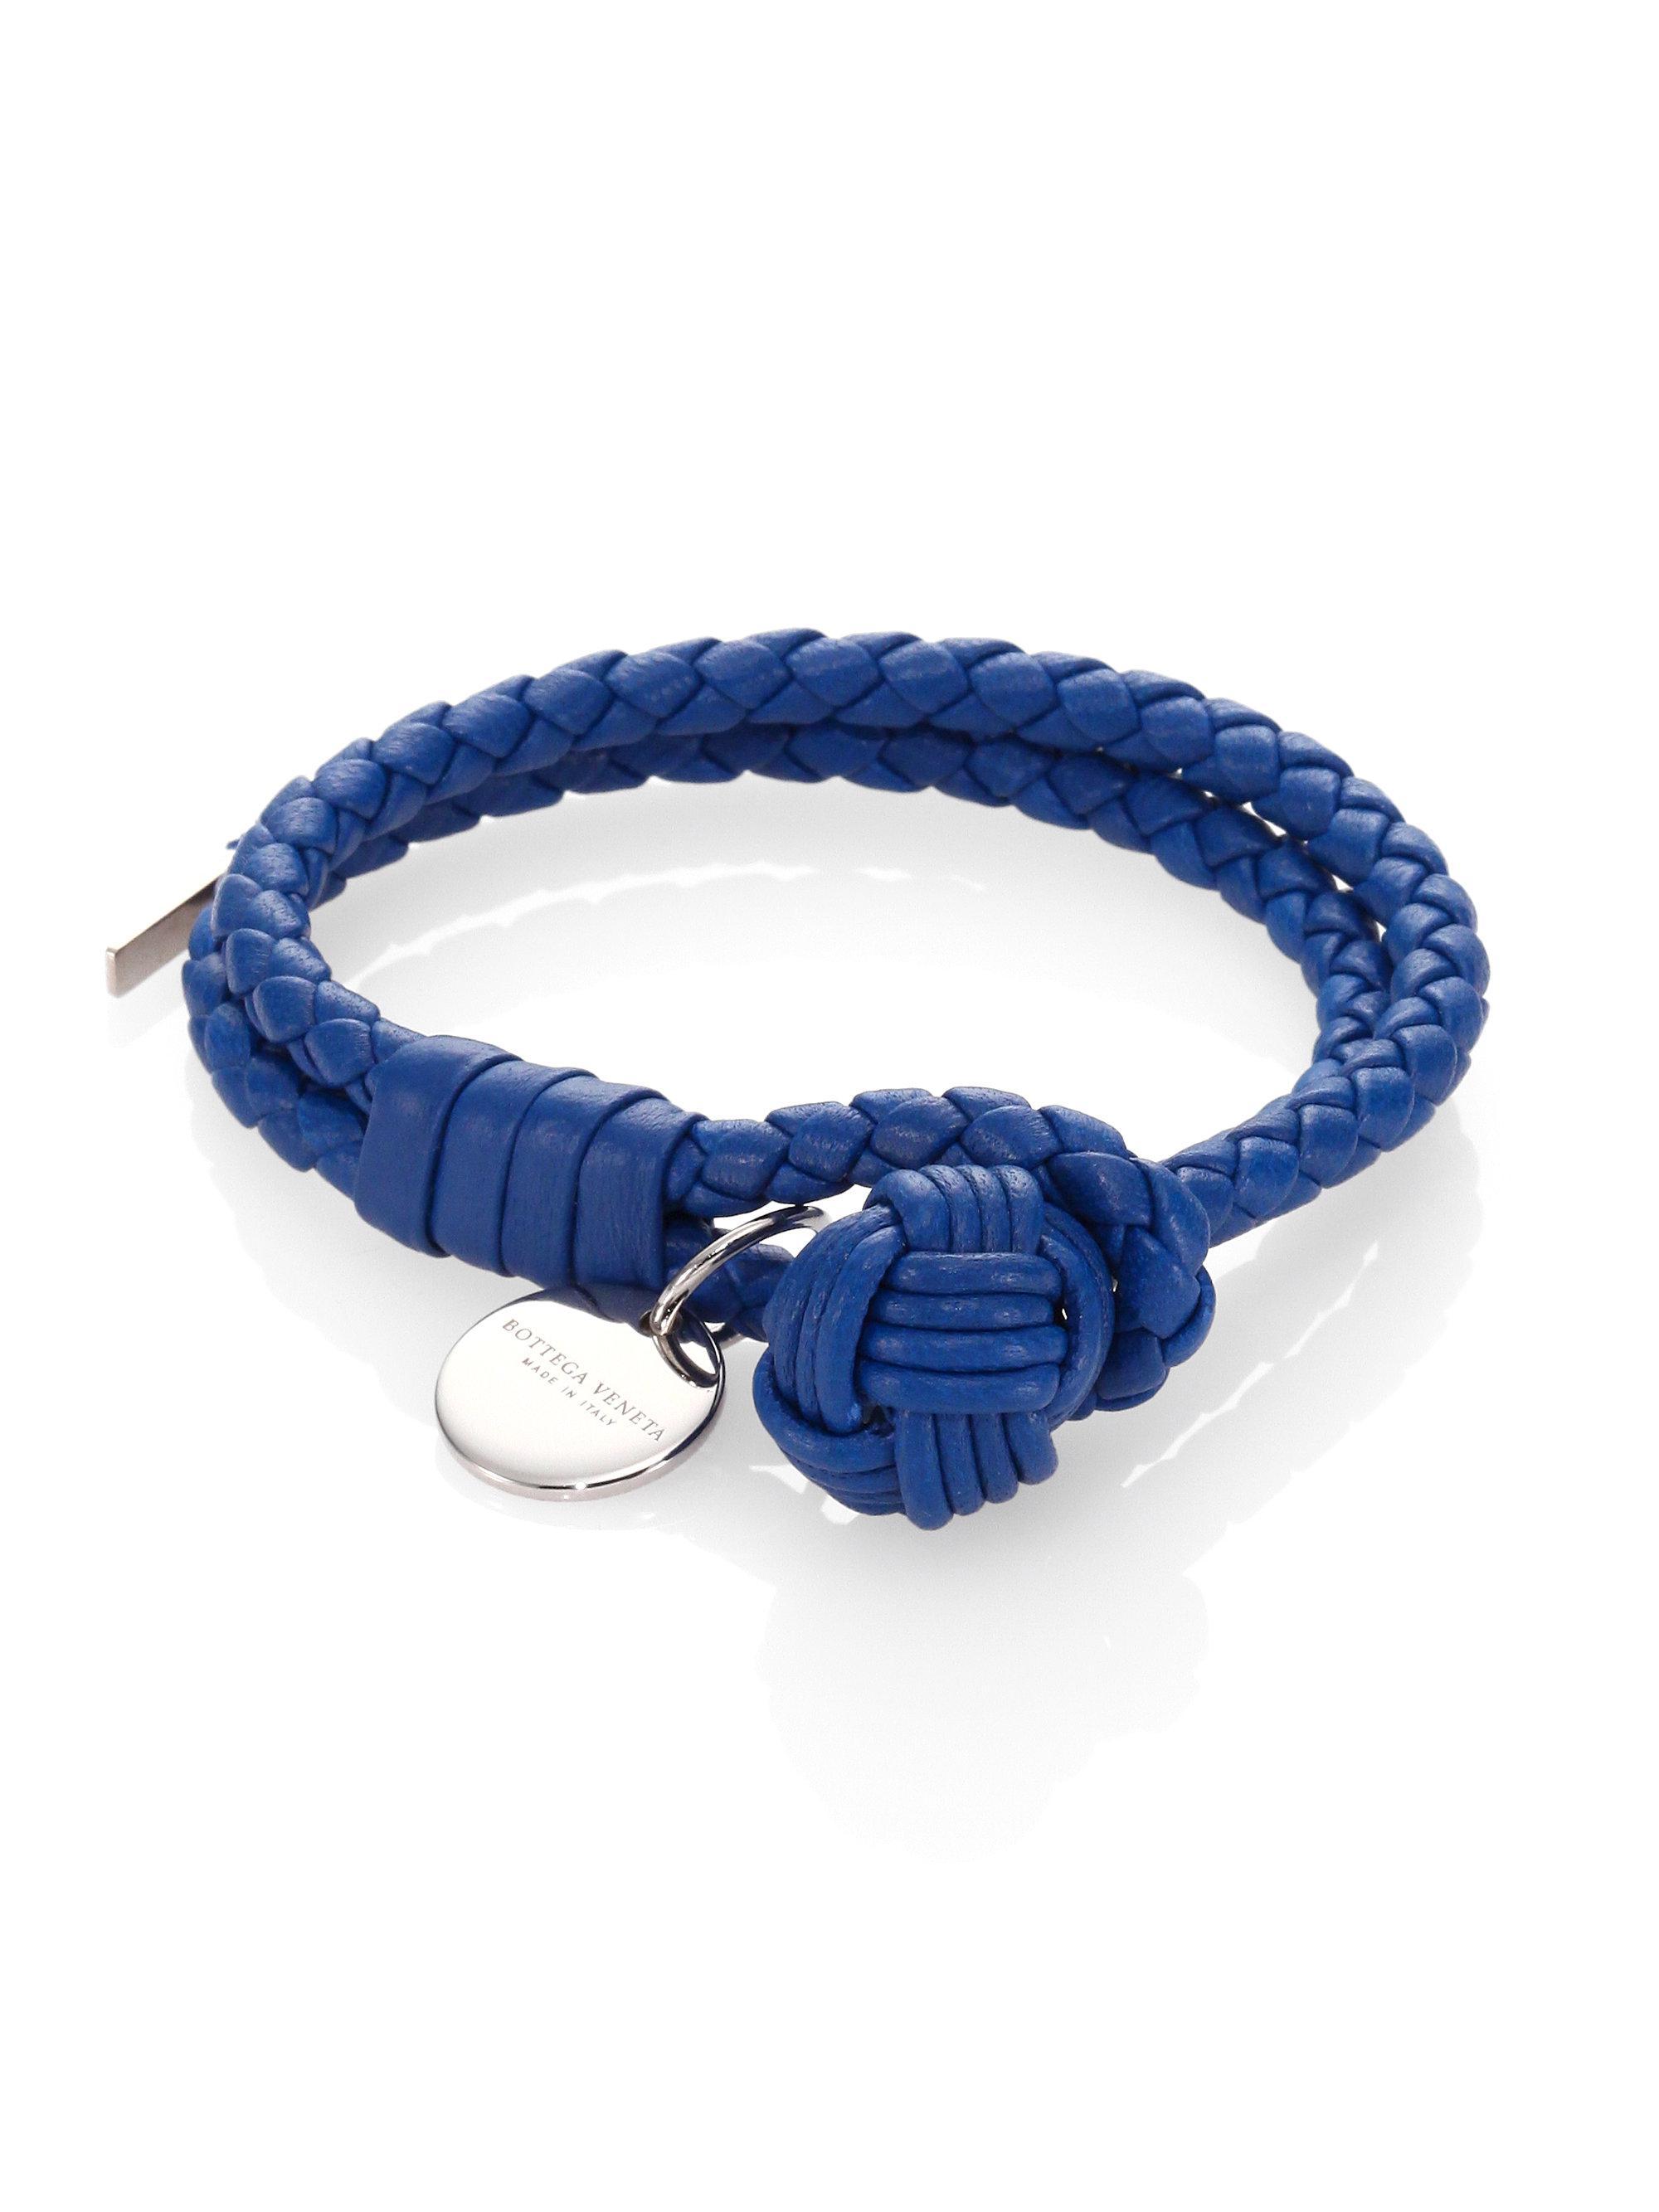 Blue Intrecciato Double Wrap Bracelet Bottega Veneta xKSBtrNeZ